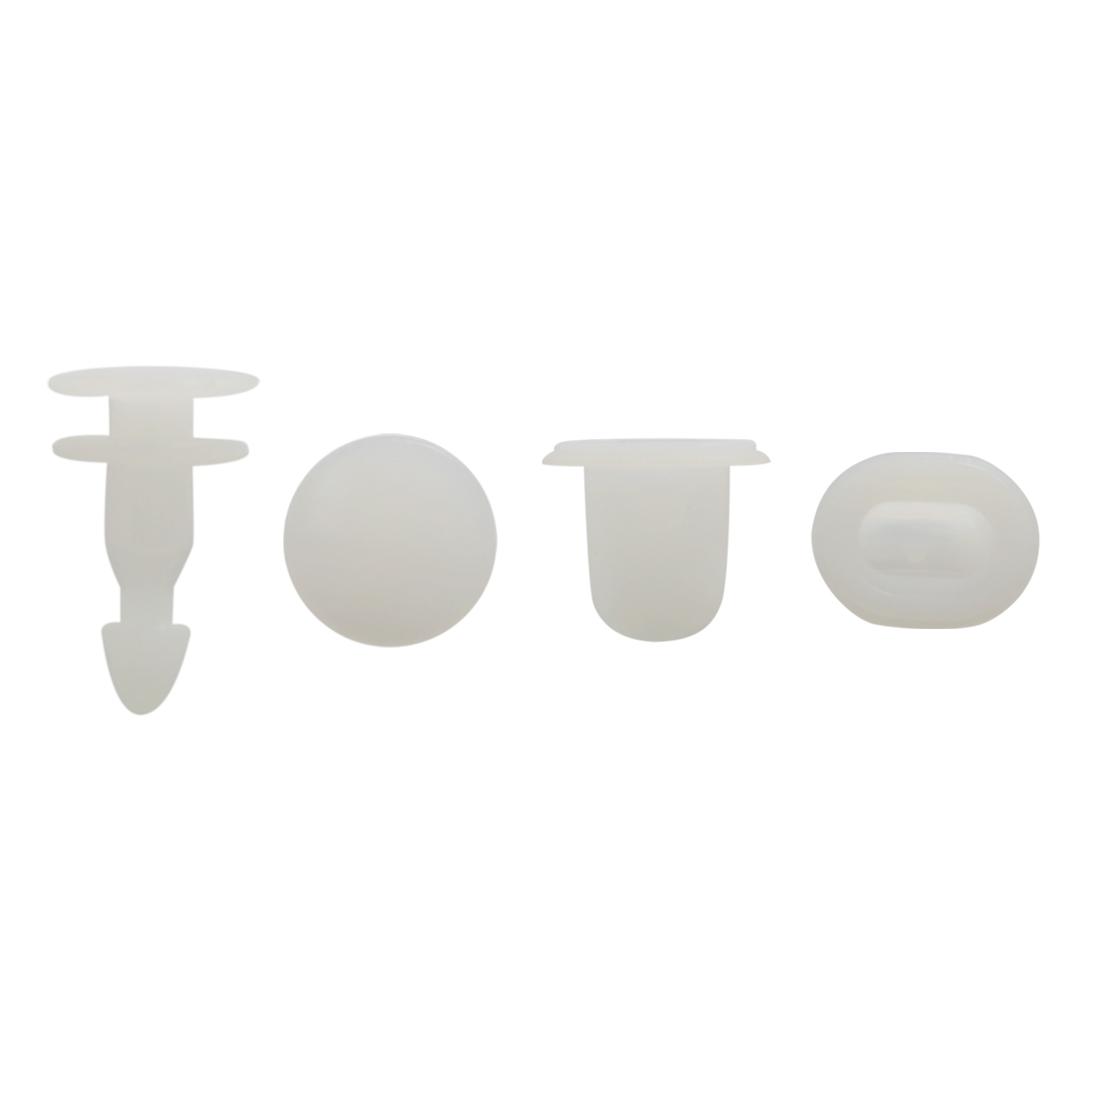 100Pcs Plastic Rivets Weatherstrip Moulding Clips Bumper Fender Fasteners 11mm